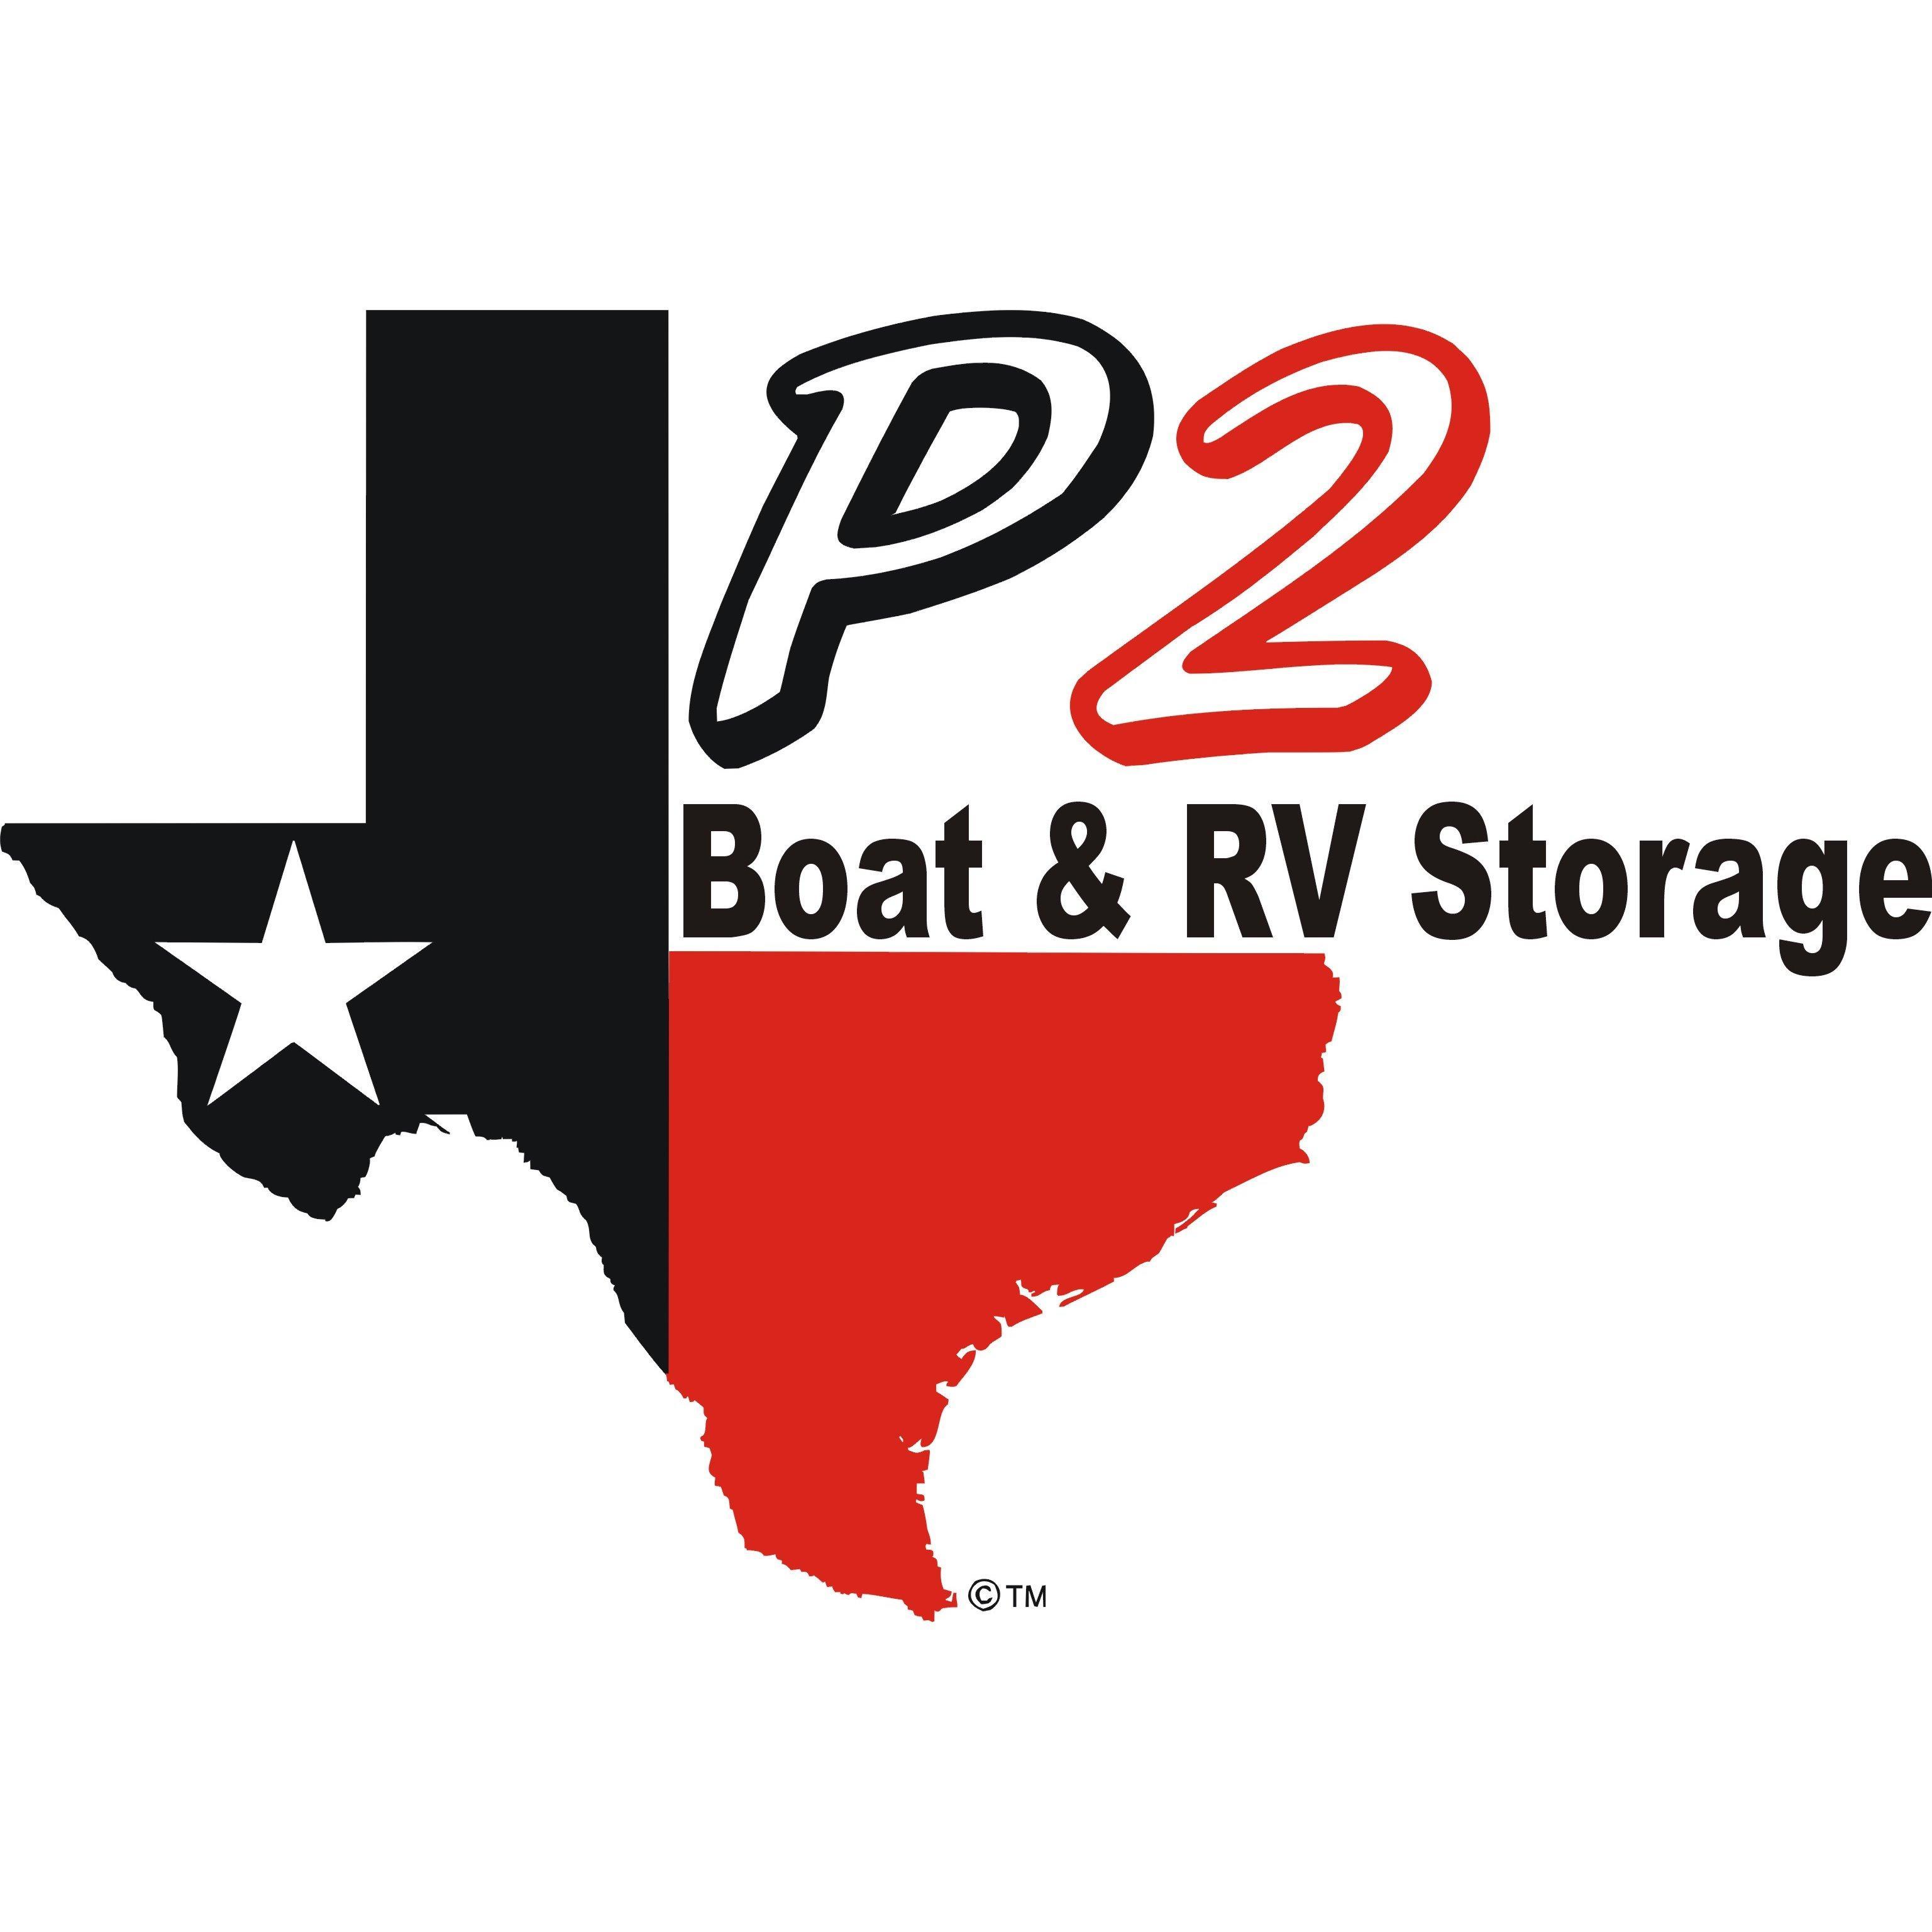 P2 Boat & RV Storage